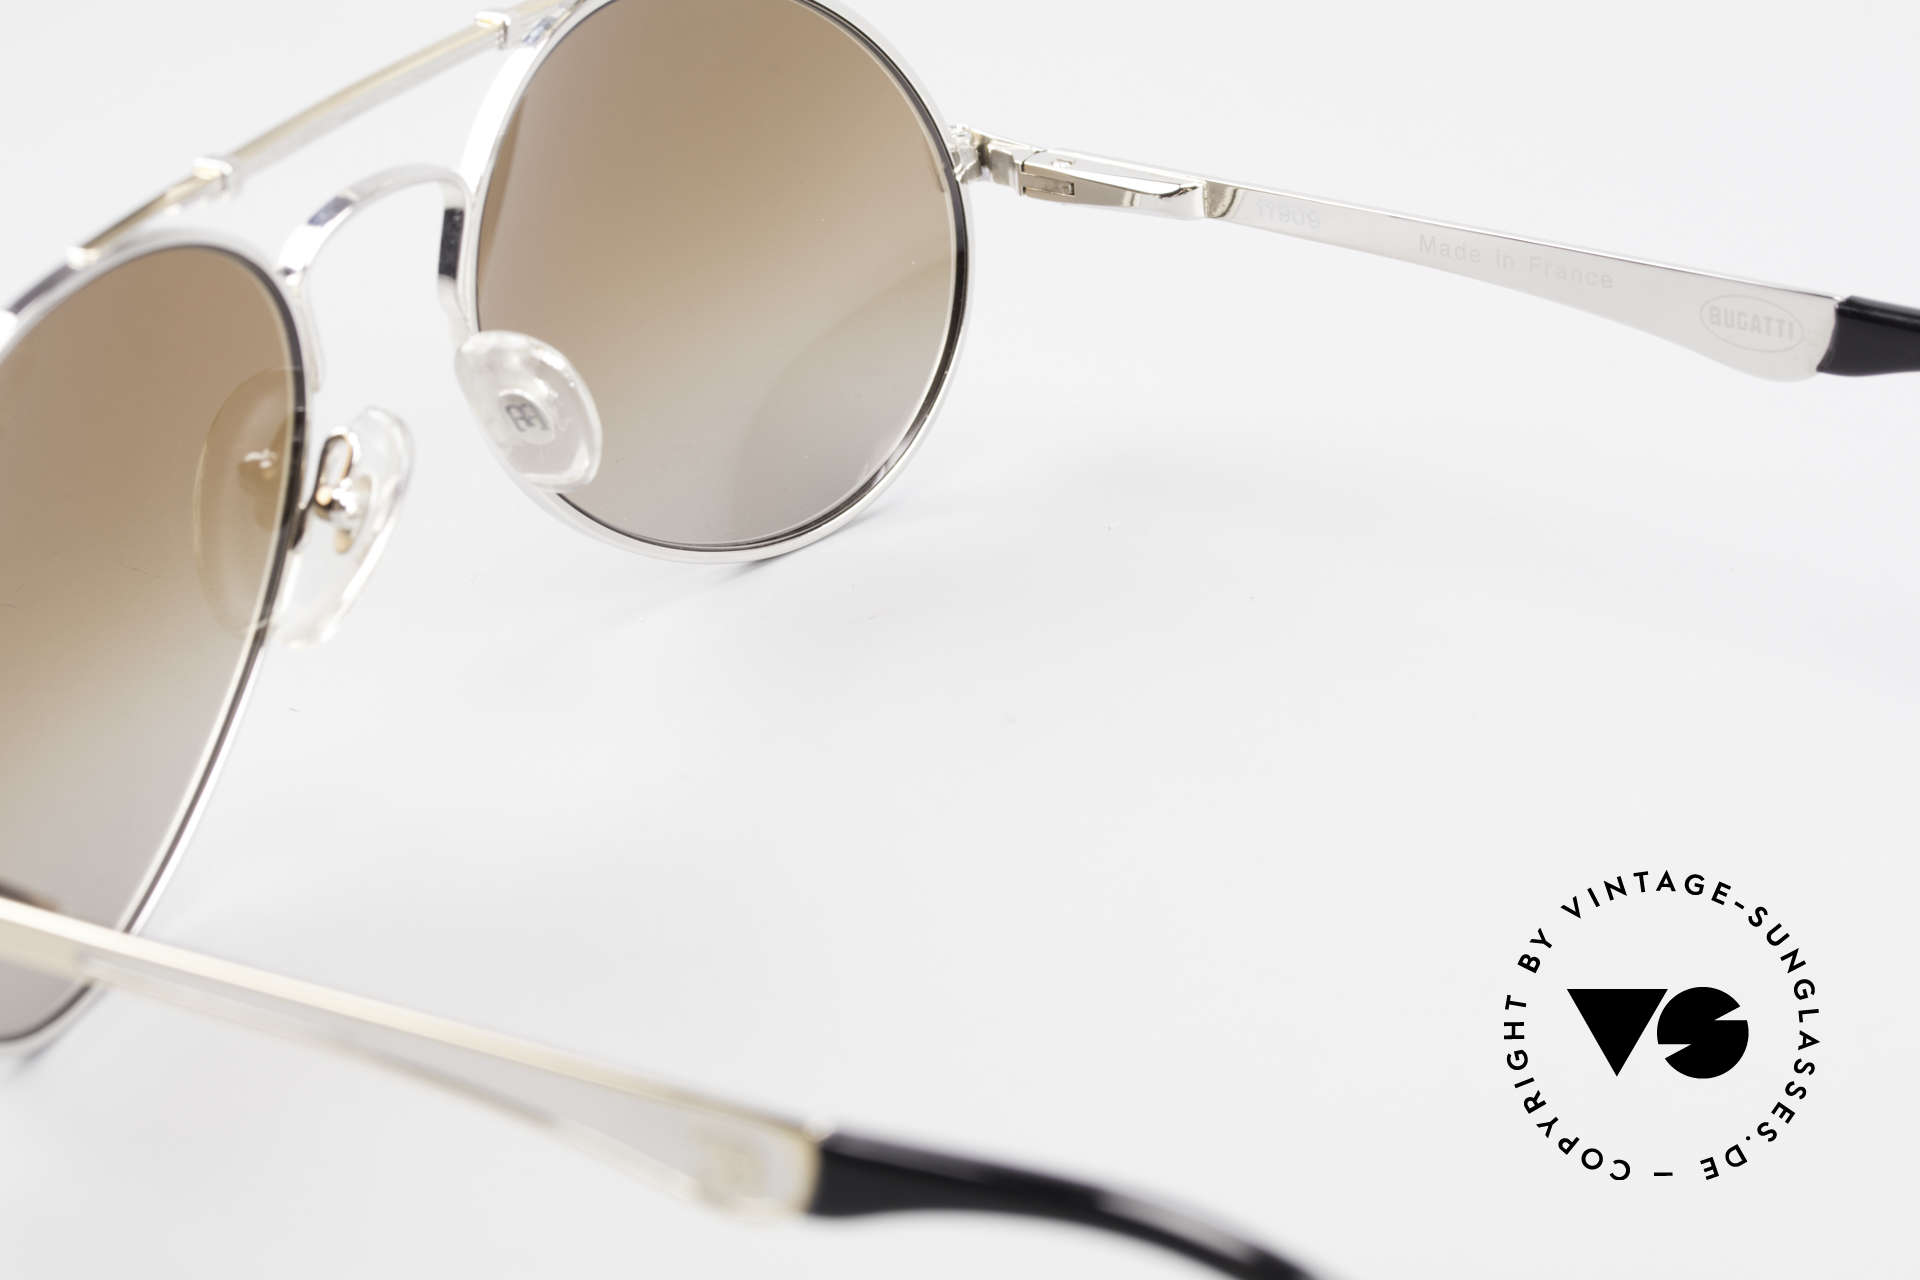 Bugatti 11909 80's Luxury Sunglasses Men, Size: large, Made for Men